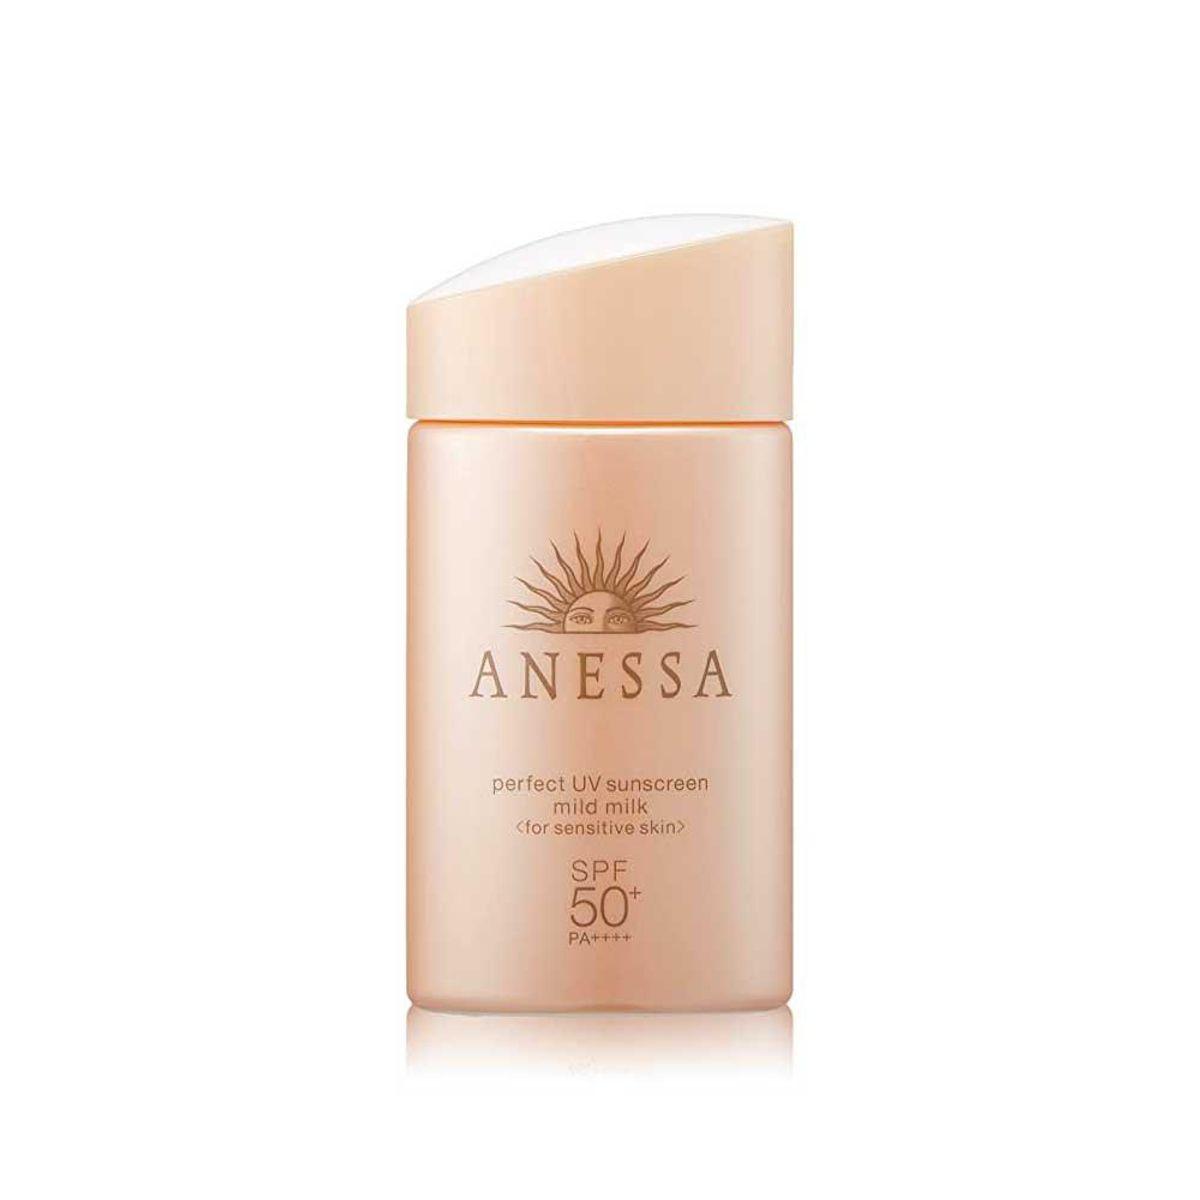 shiseido anessa perfect uv sunscreen mild milk a spf 50